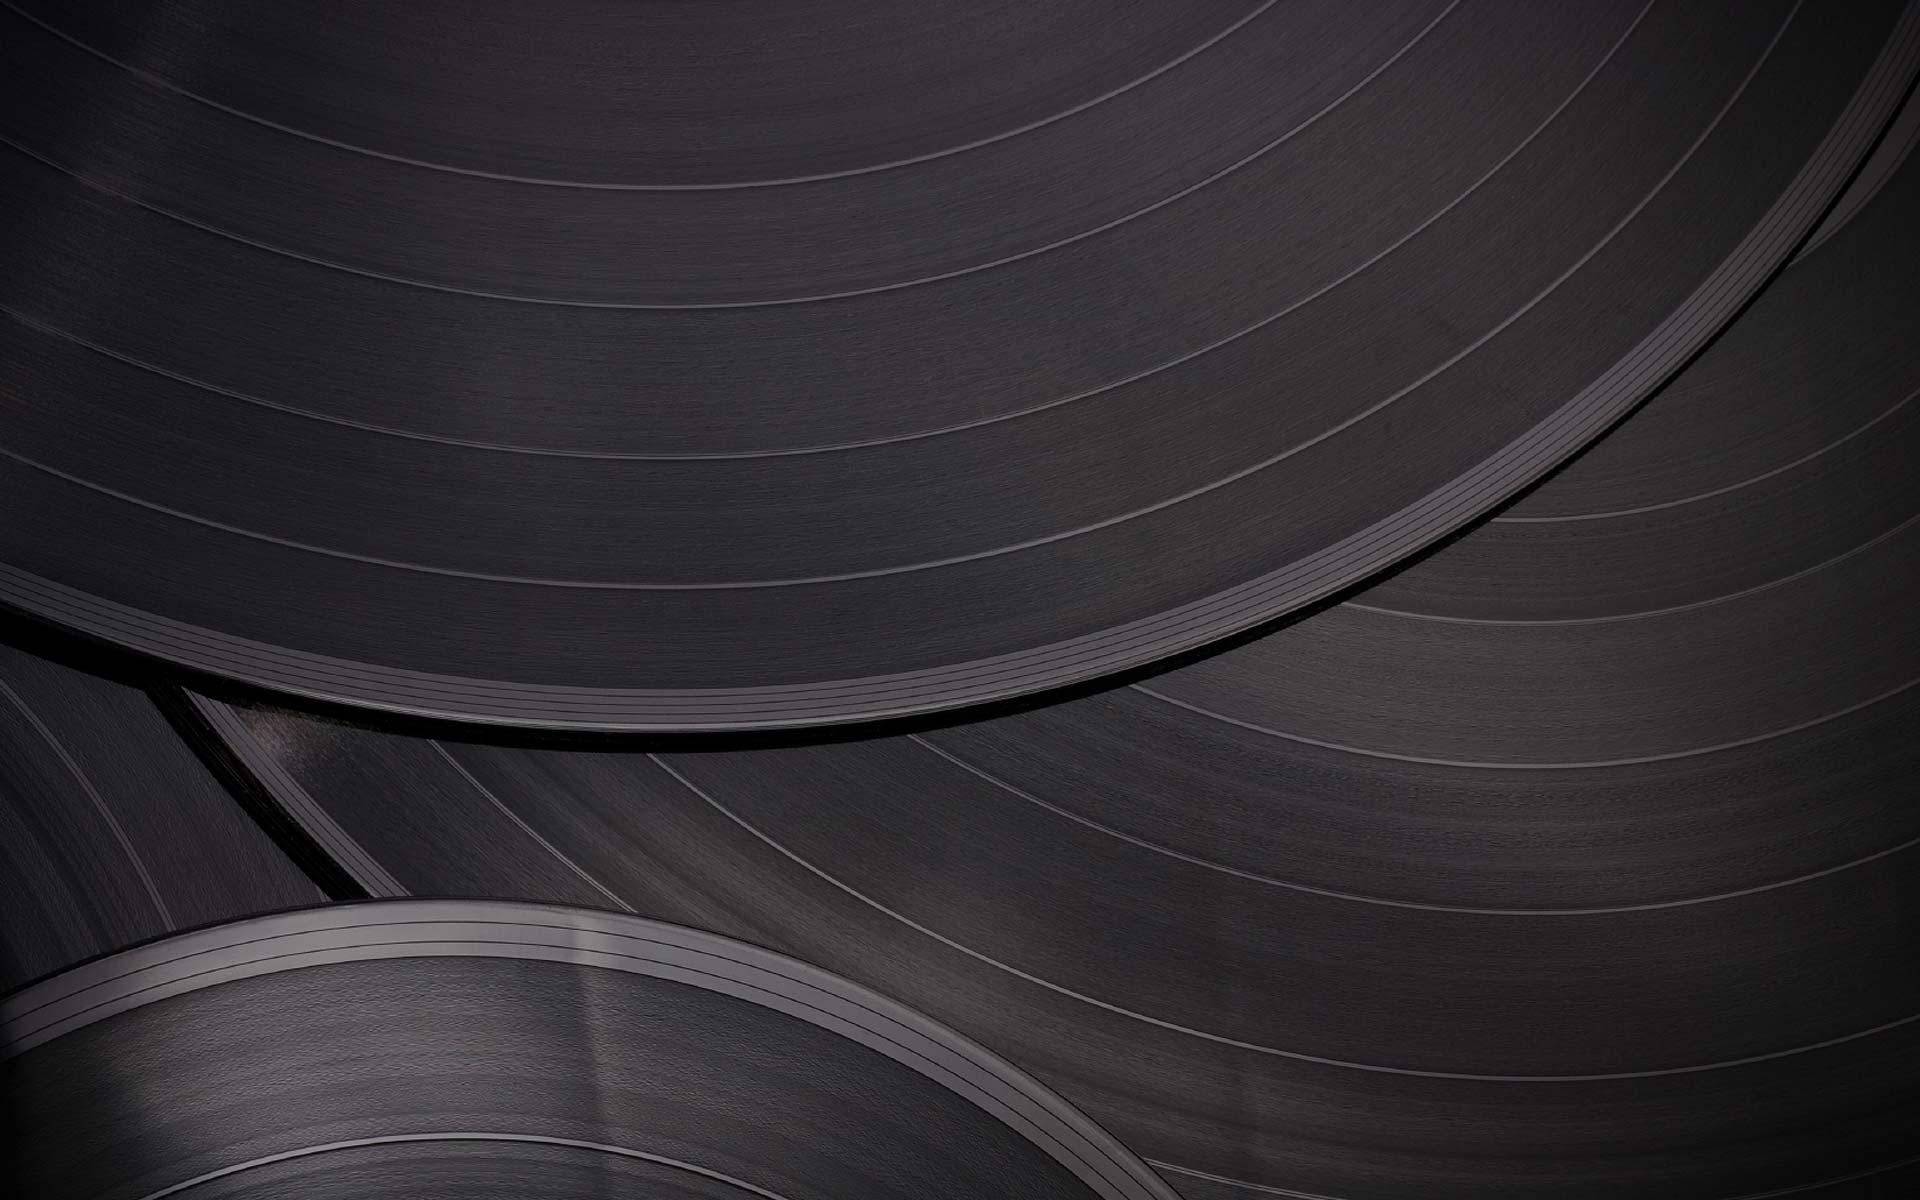 Vinyl Record Background wallpaper   340516 1920x1200